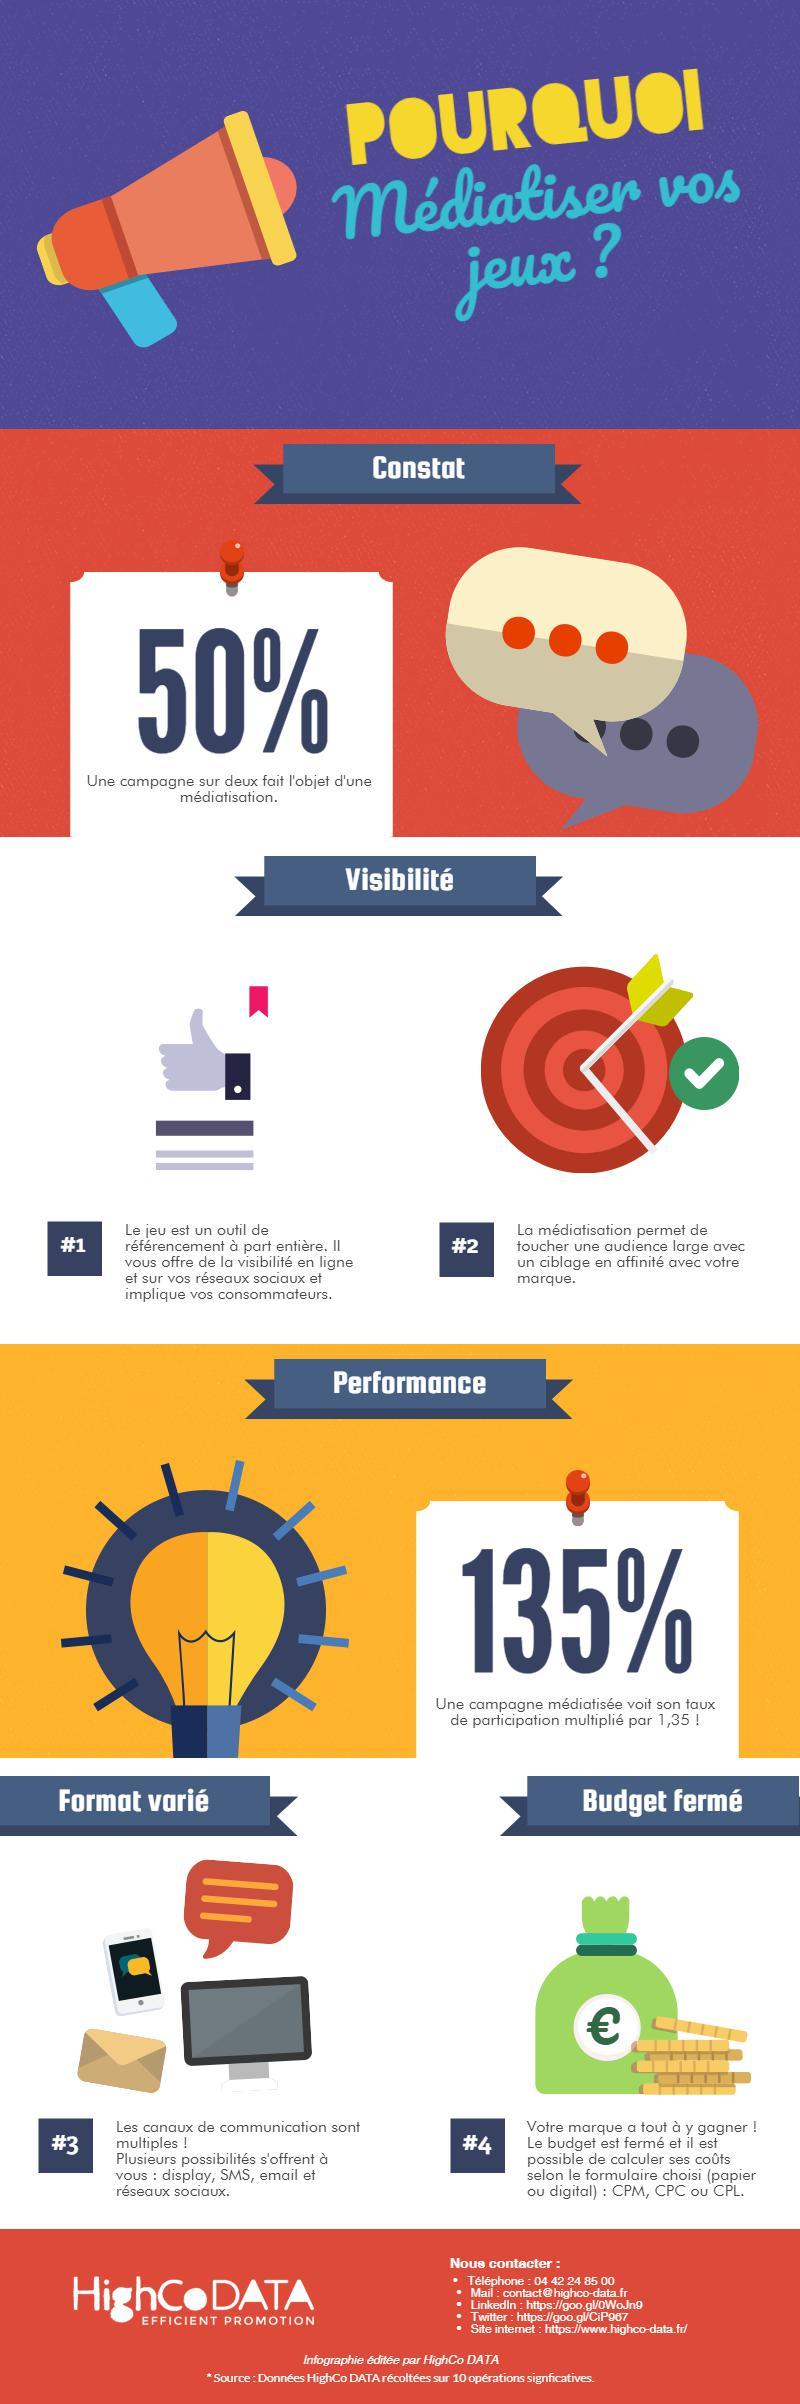 infographie médiatisation et gamification